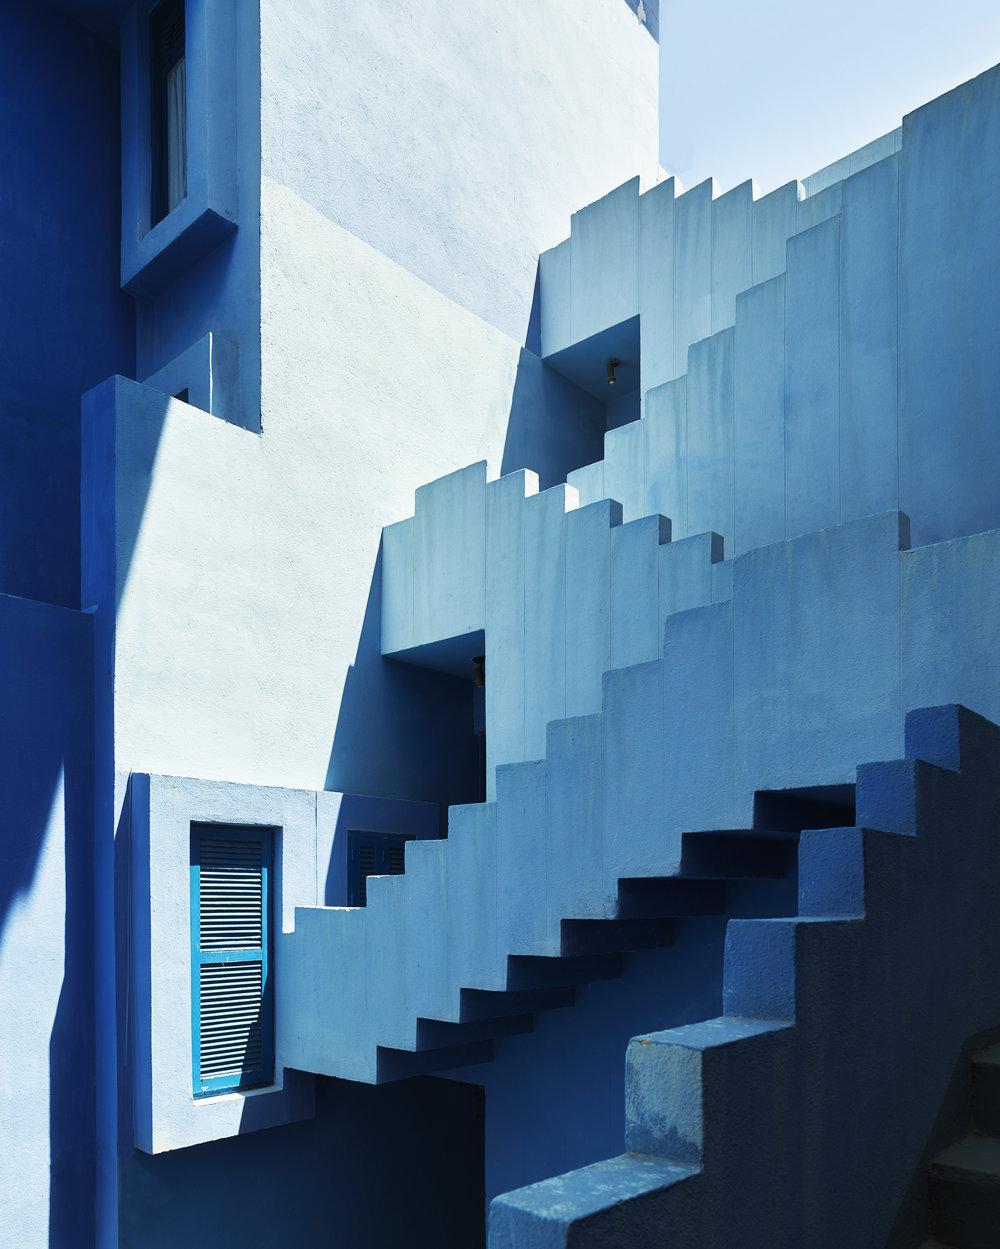 Muralla_Roja_Calpe_Spain_Ricardo_Bofill_Taller_Arquitectura_025.jpg